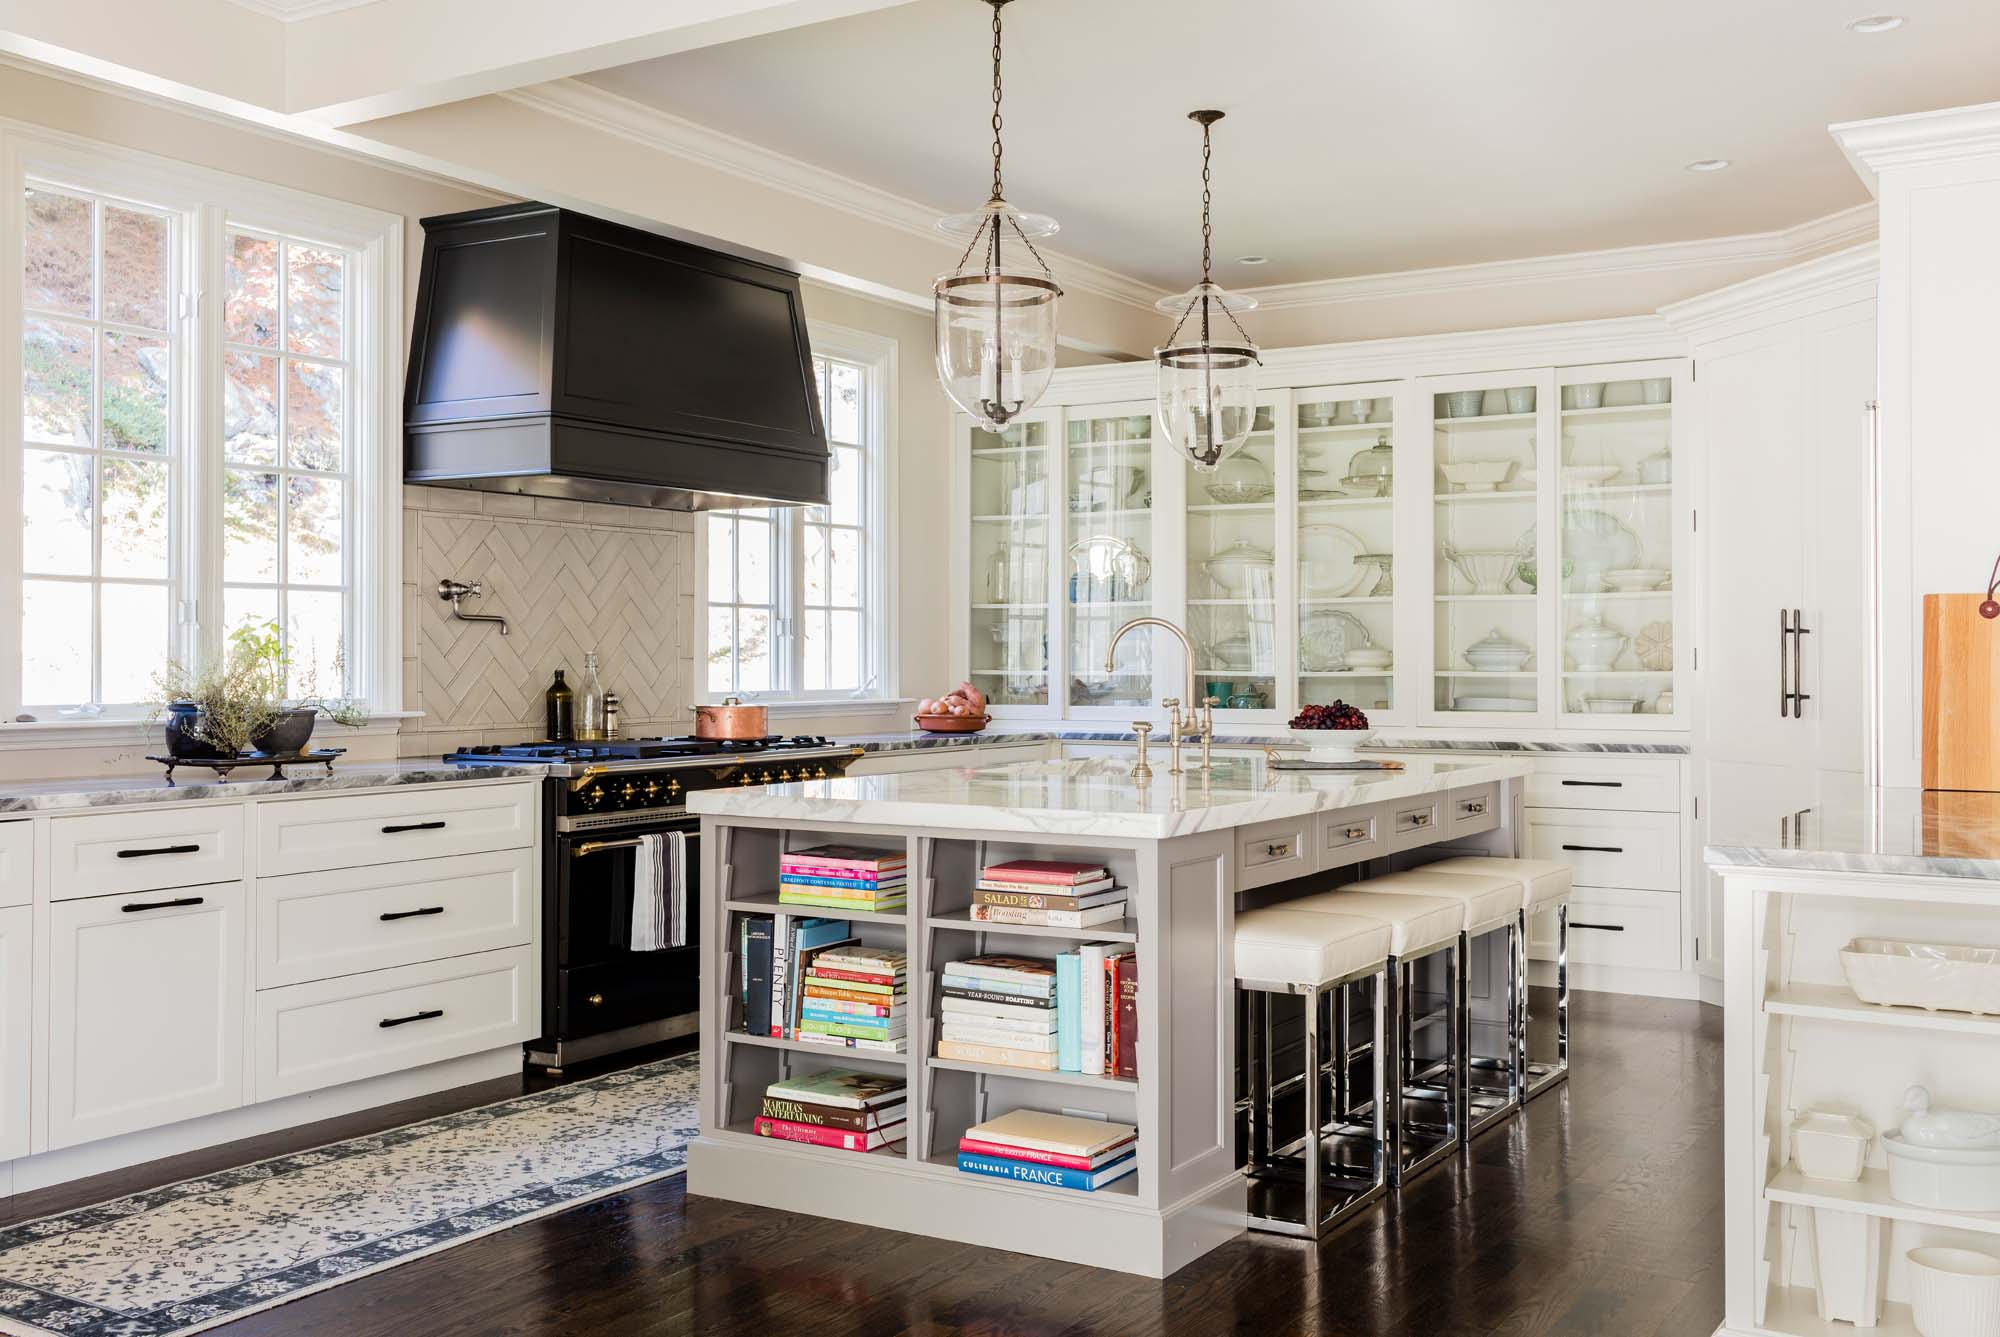 1 KIT for DNE entire kitchen.jpg